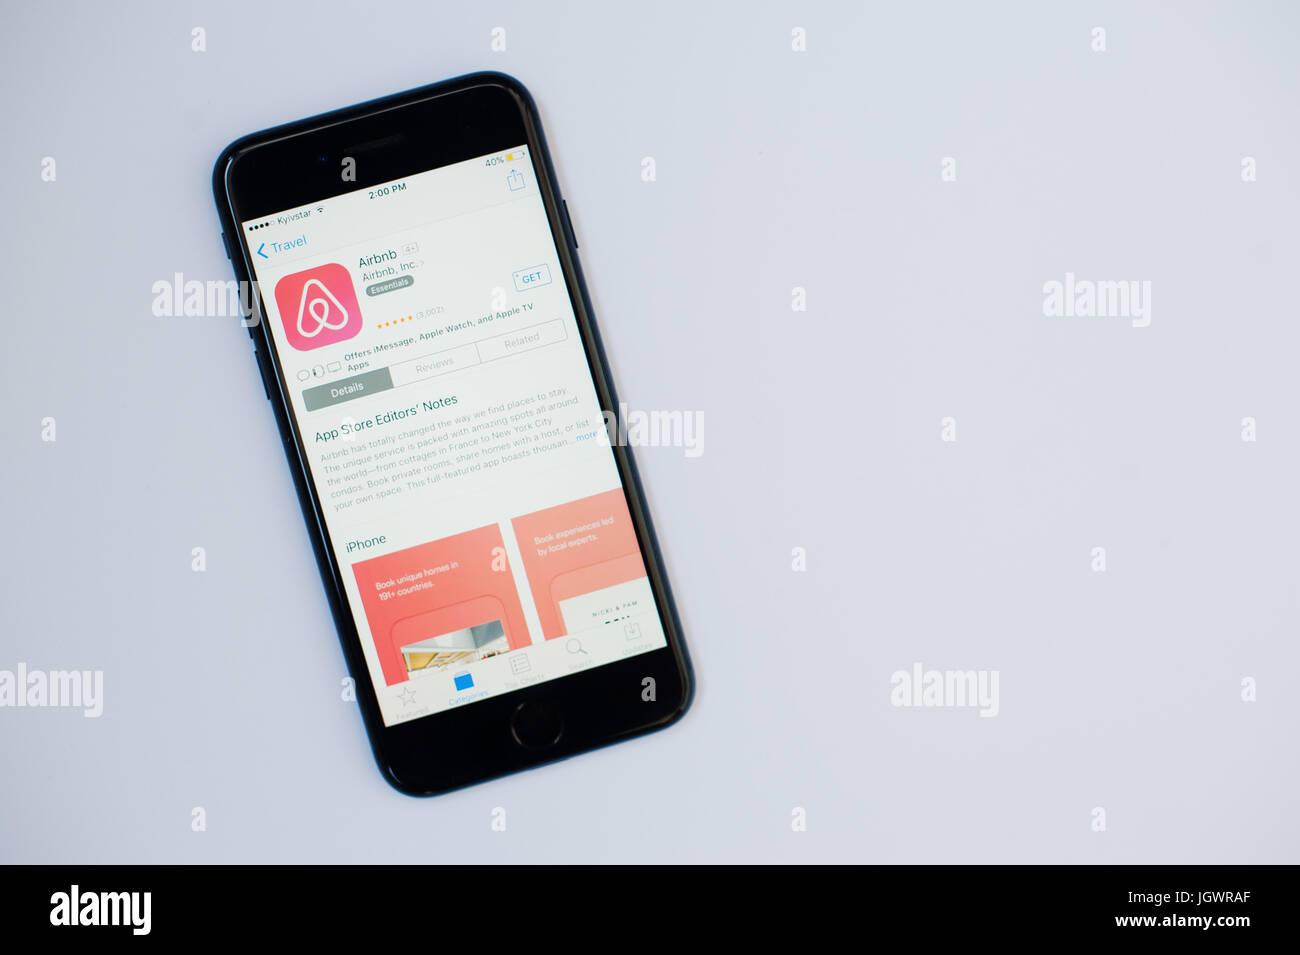 Kyiv Ukraine Jul 11 2017 Apple Iphone 7 With Airbnb Application